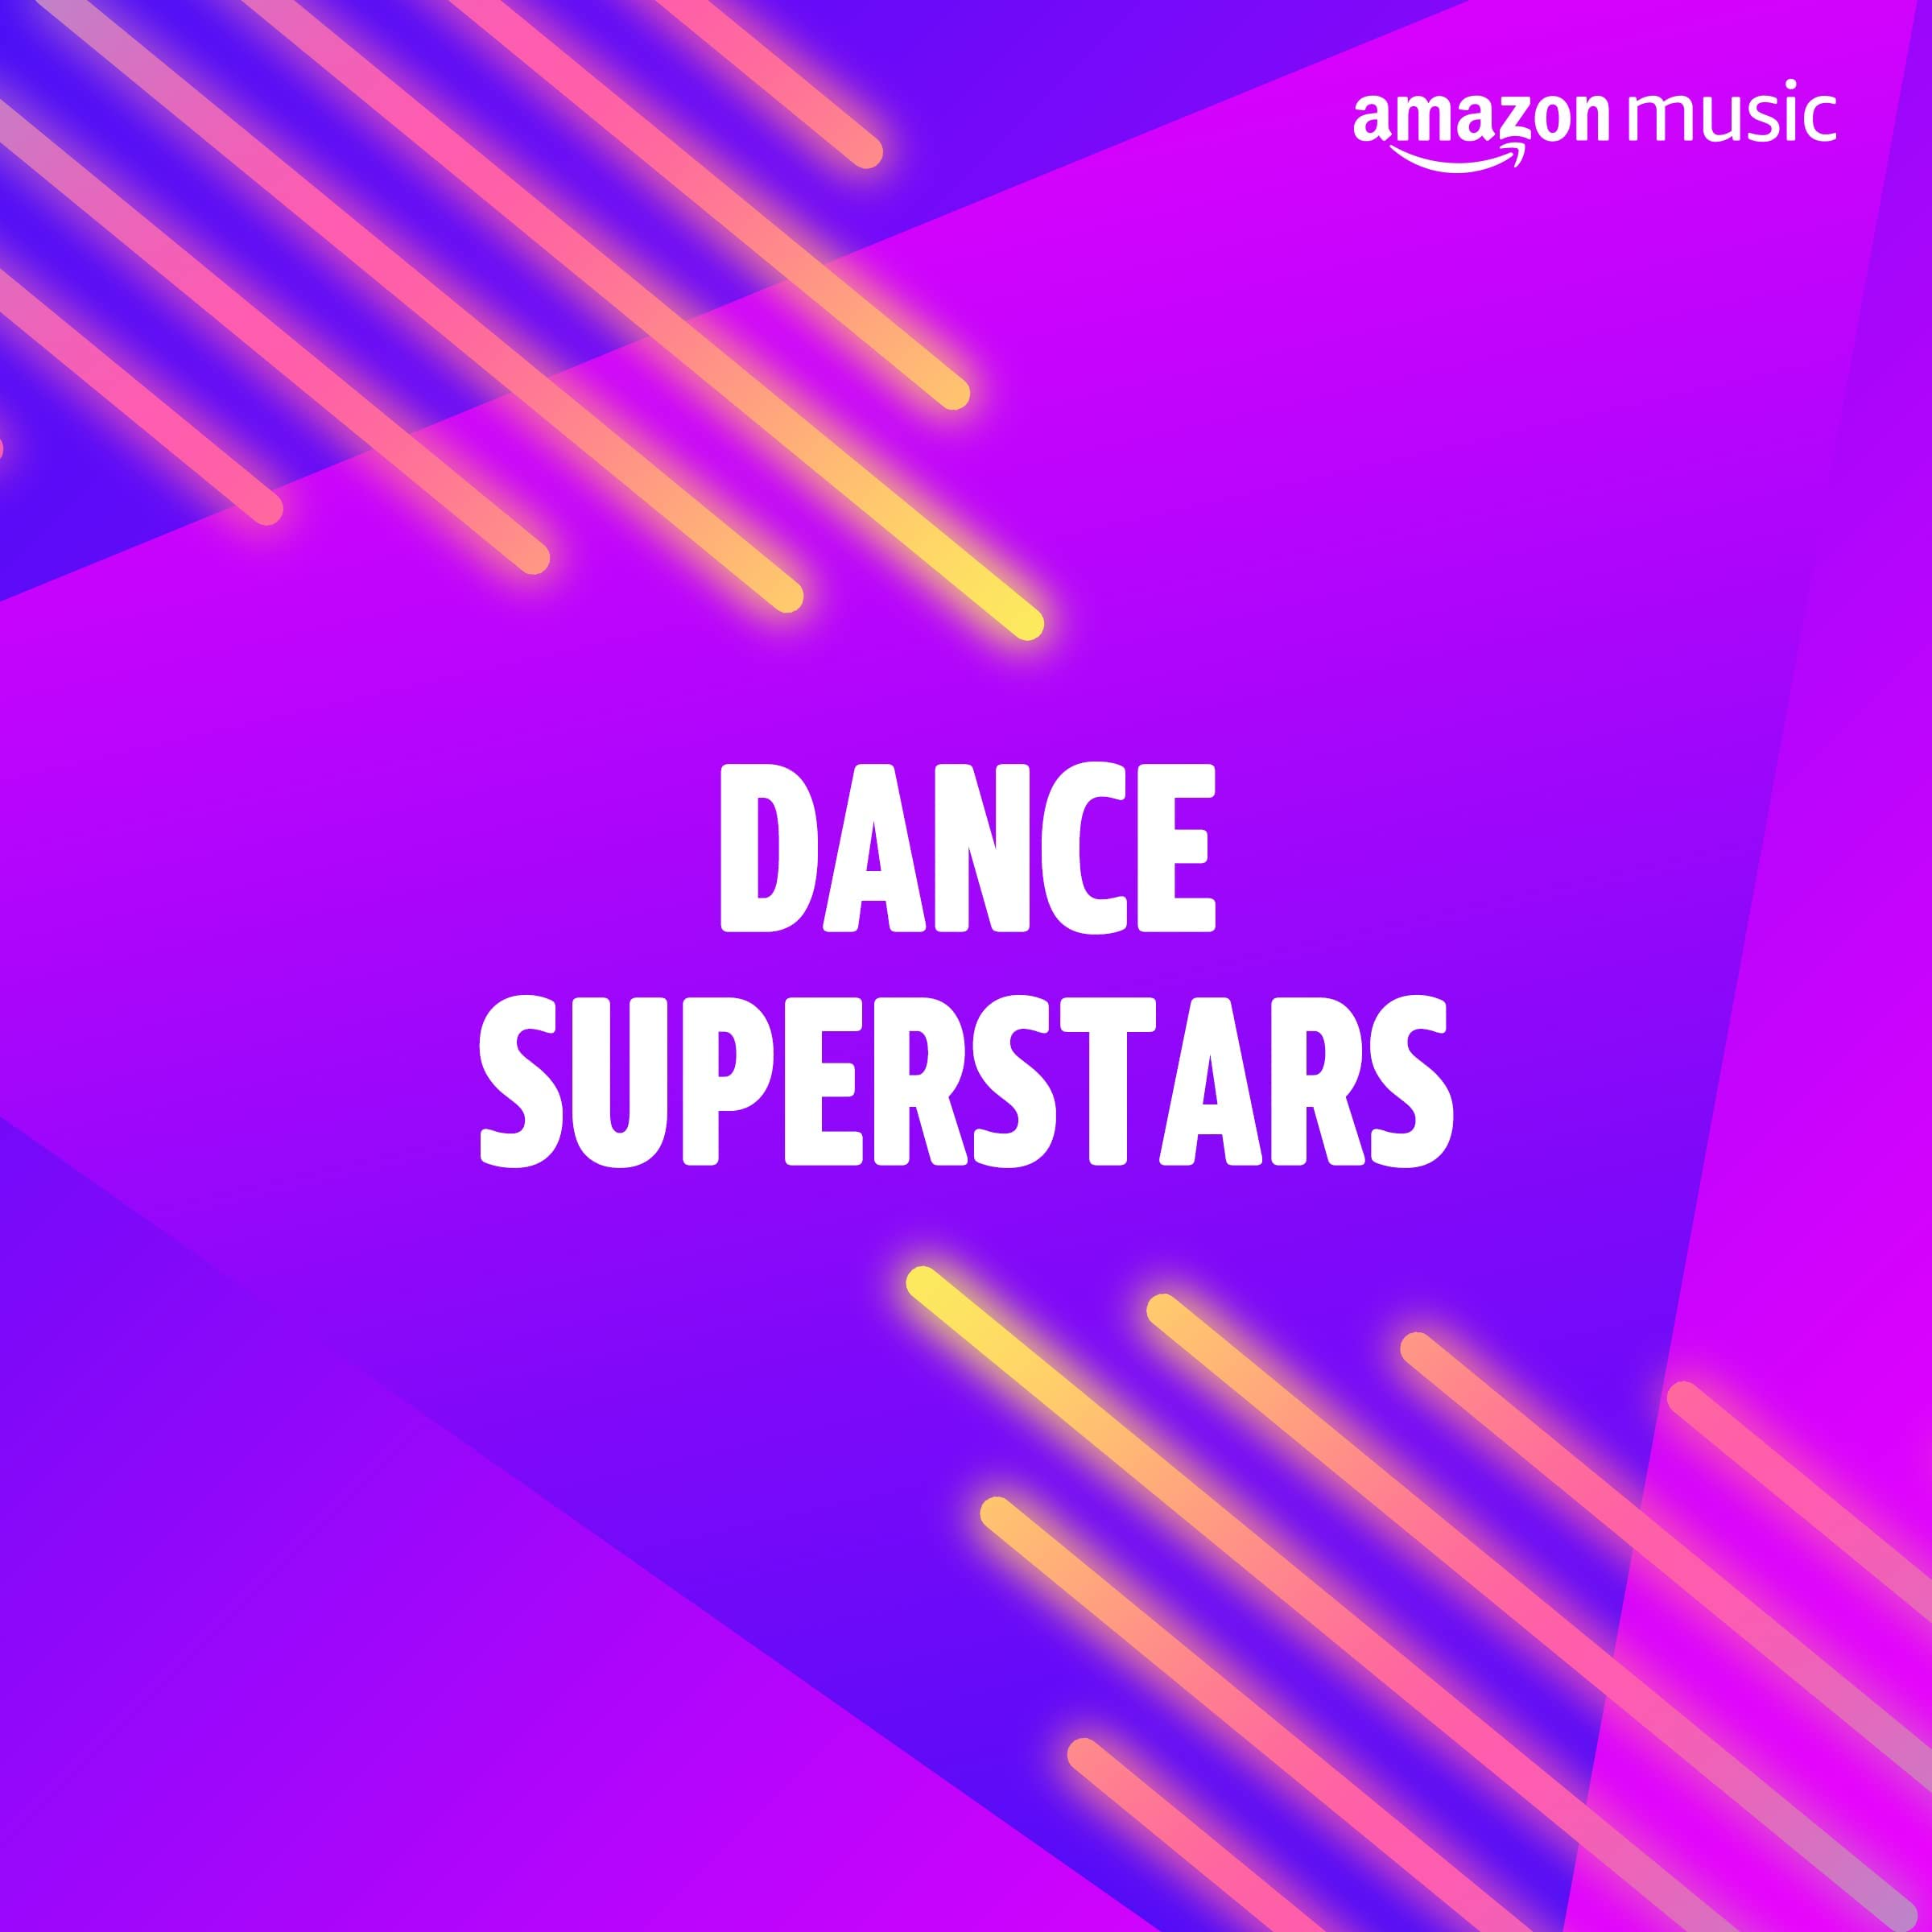 Dance Superstars